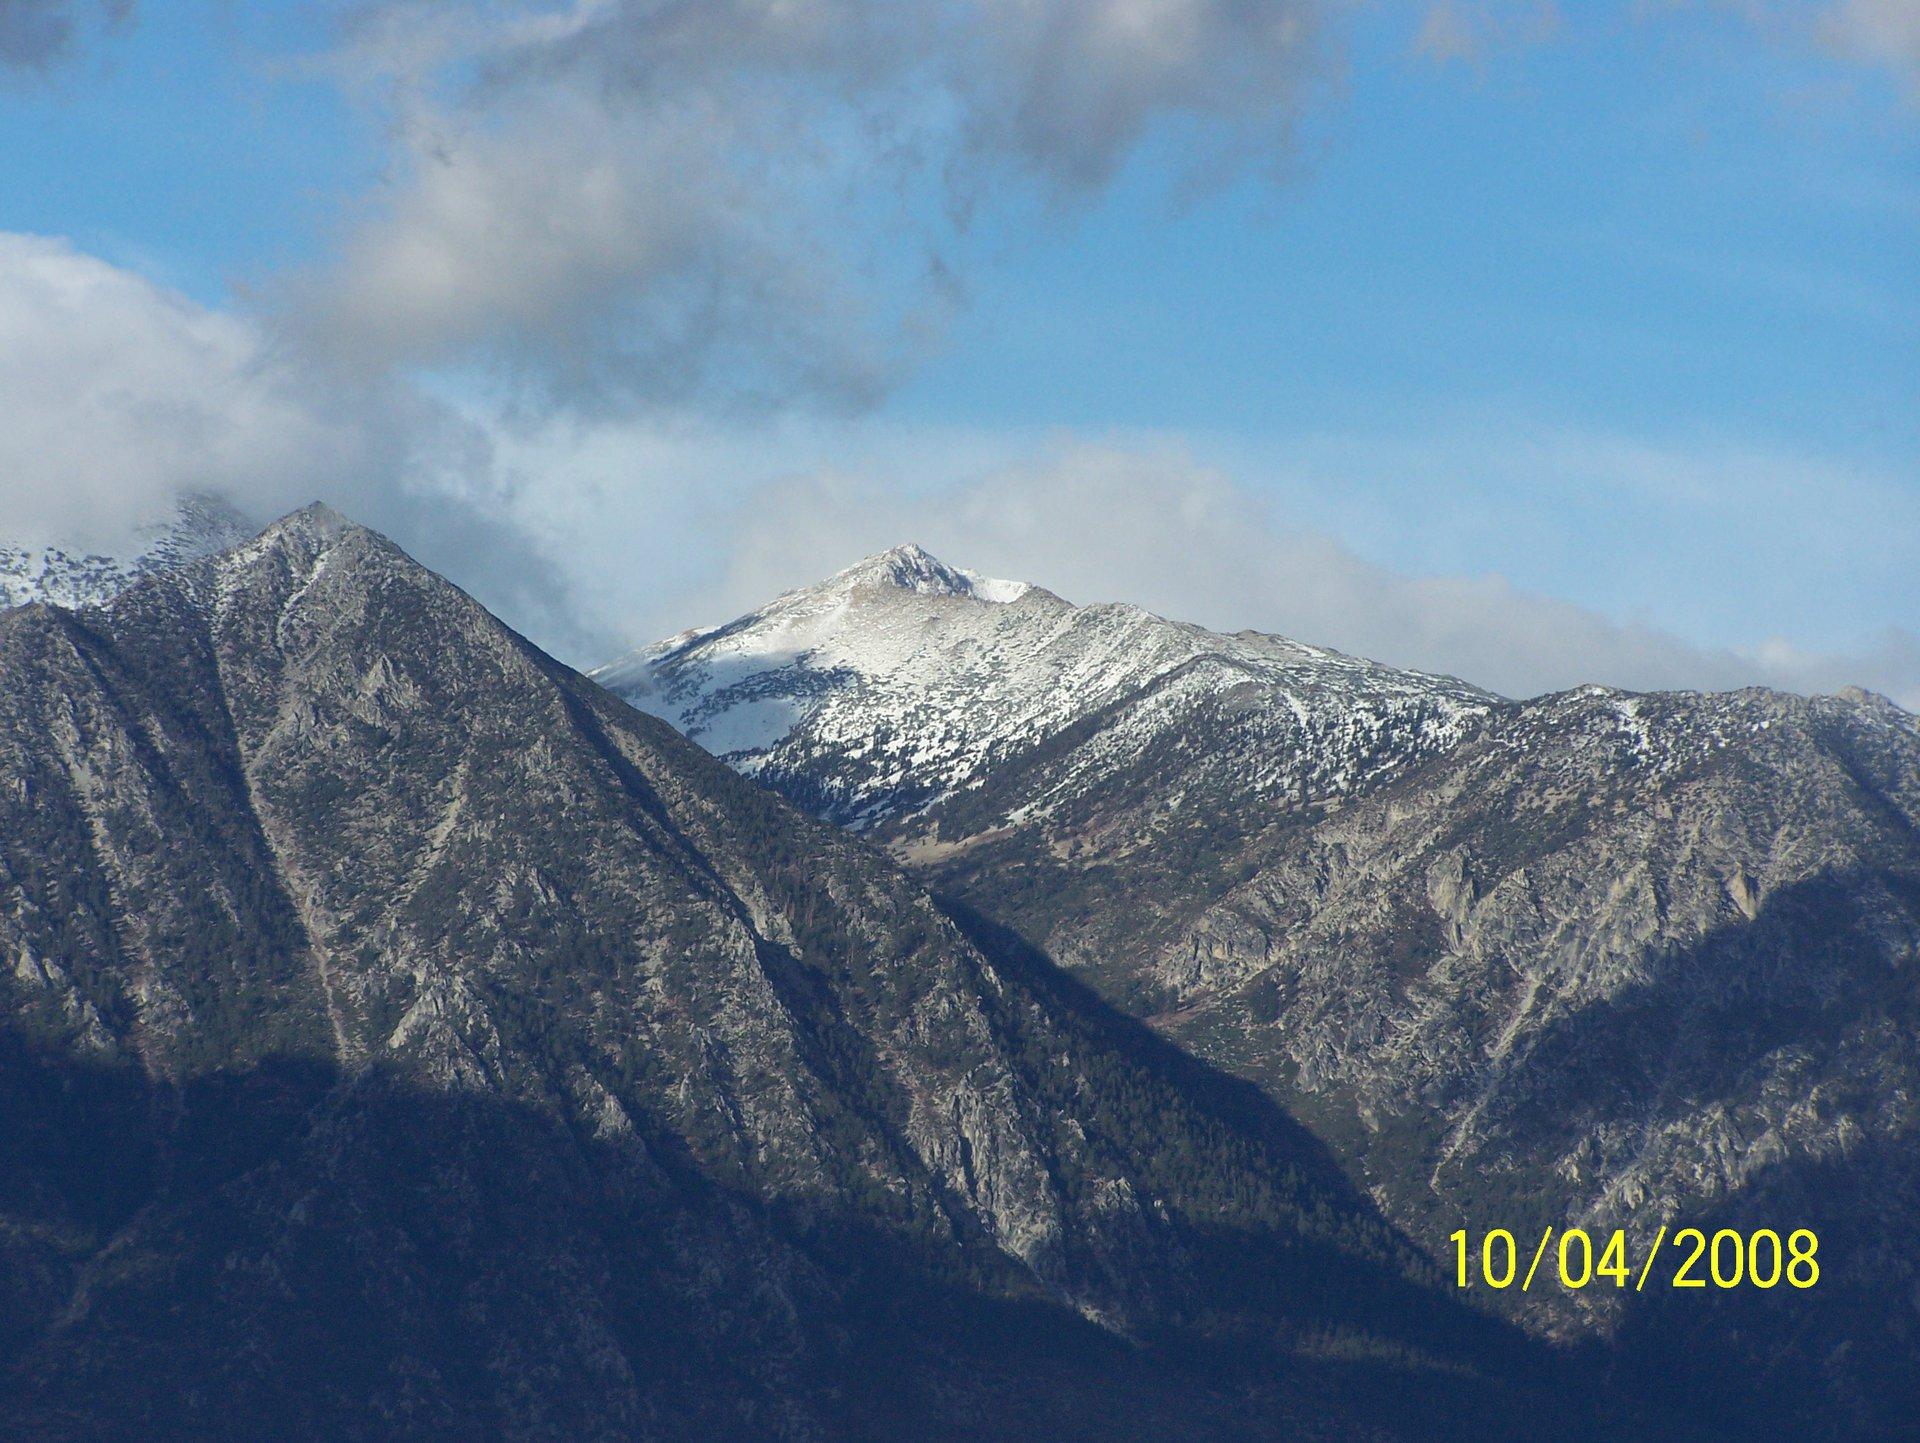 Sierra nevadas first snow of 08 october 3rd